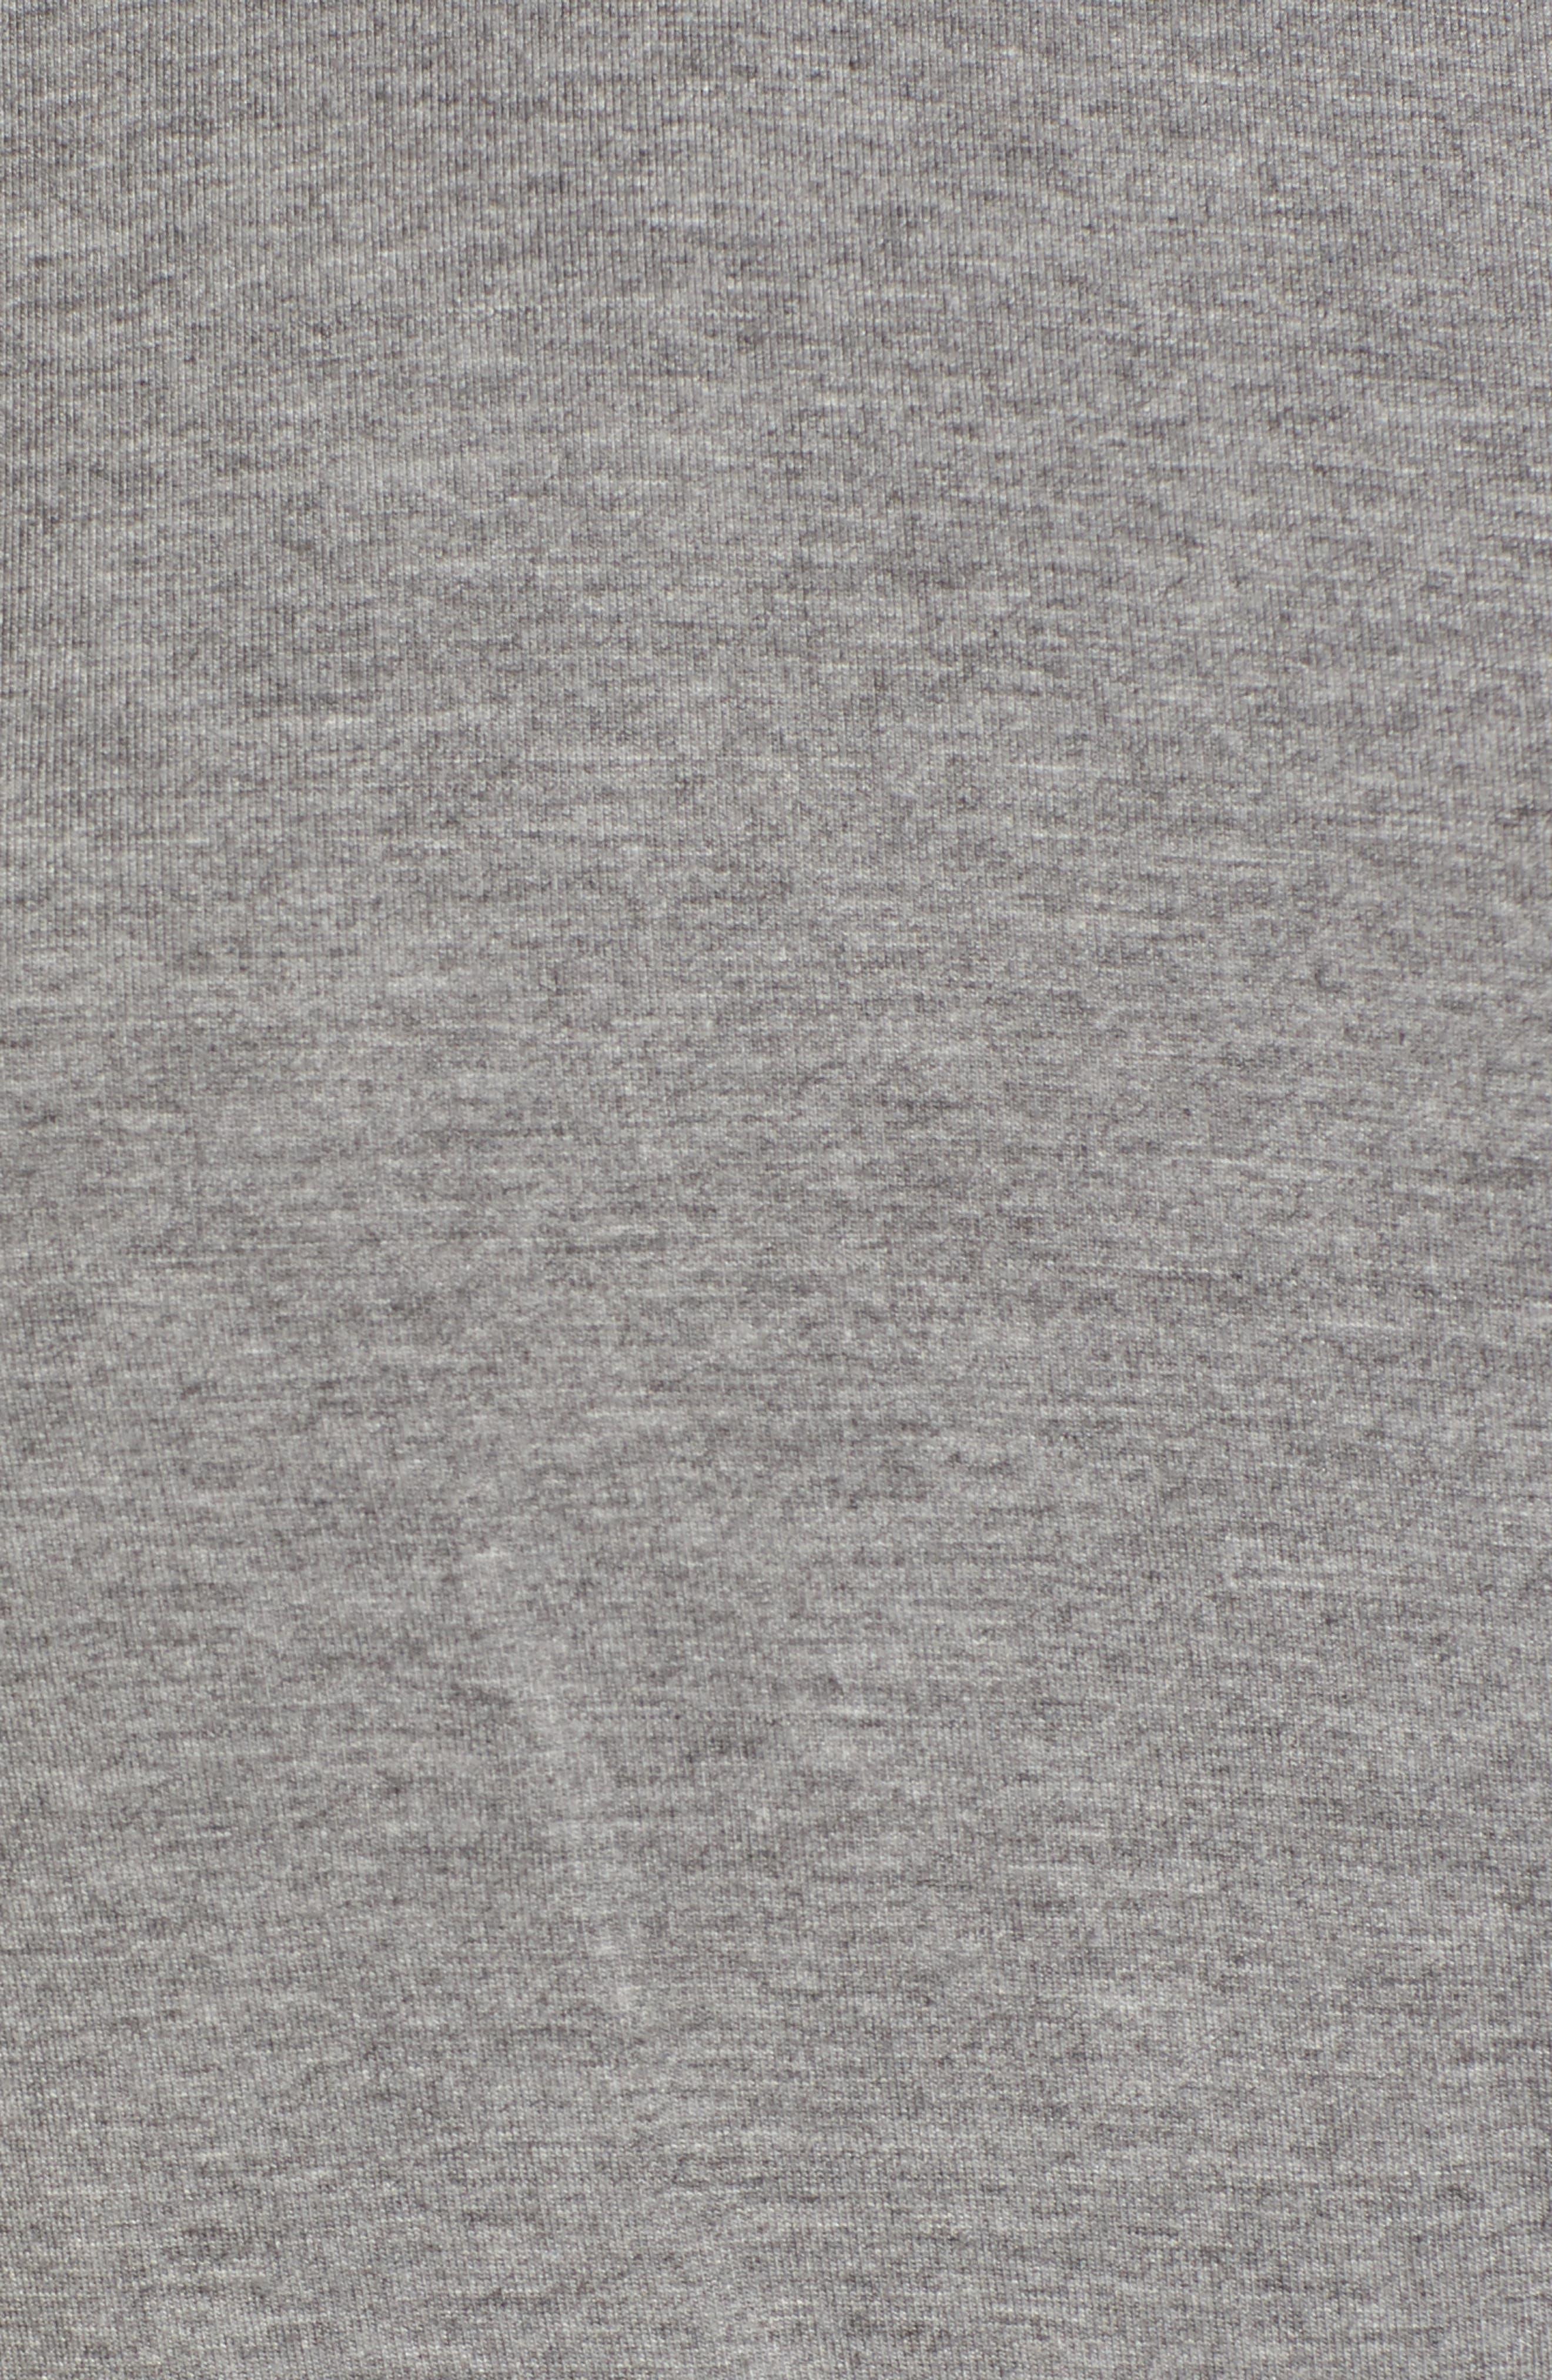 Off-Duty Shirred Sleeveless Tee,                             Alternate thumbnail 5, color,                             Grey Heather